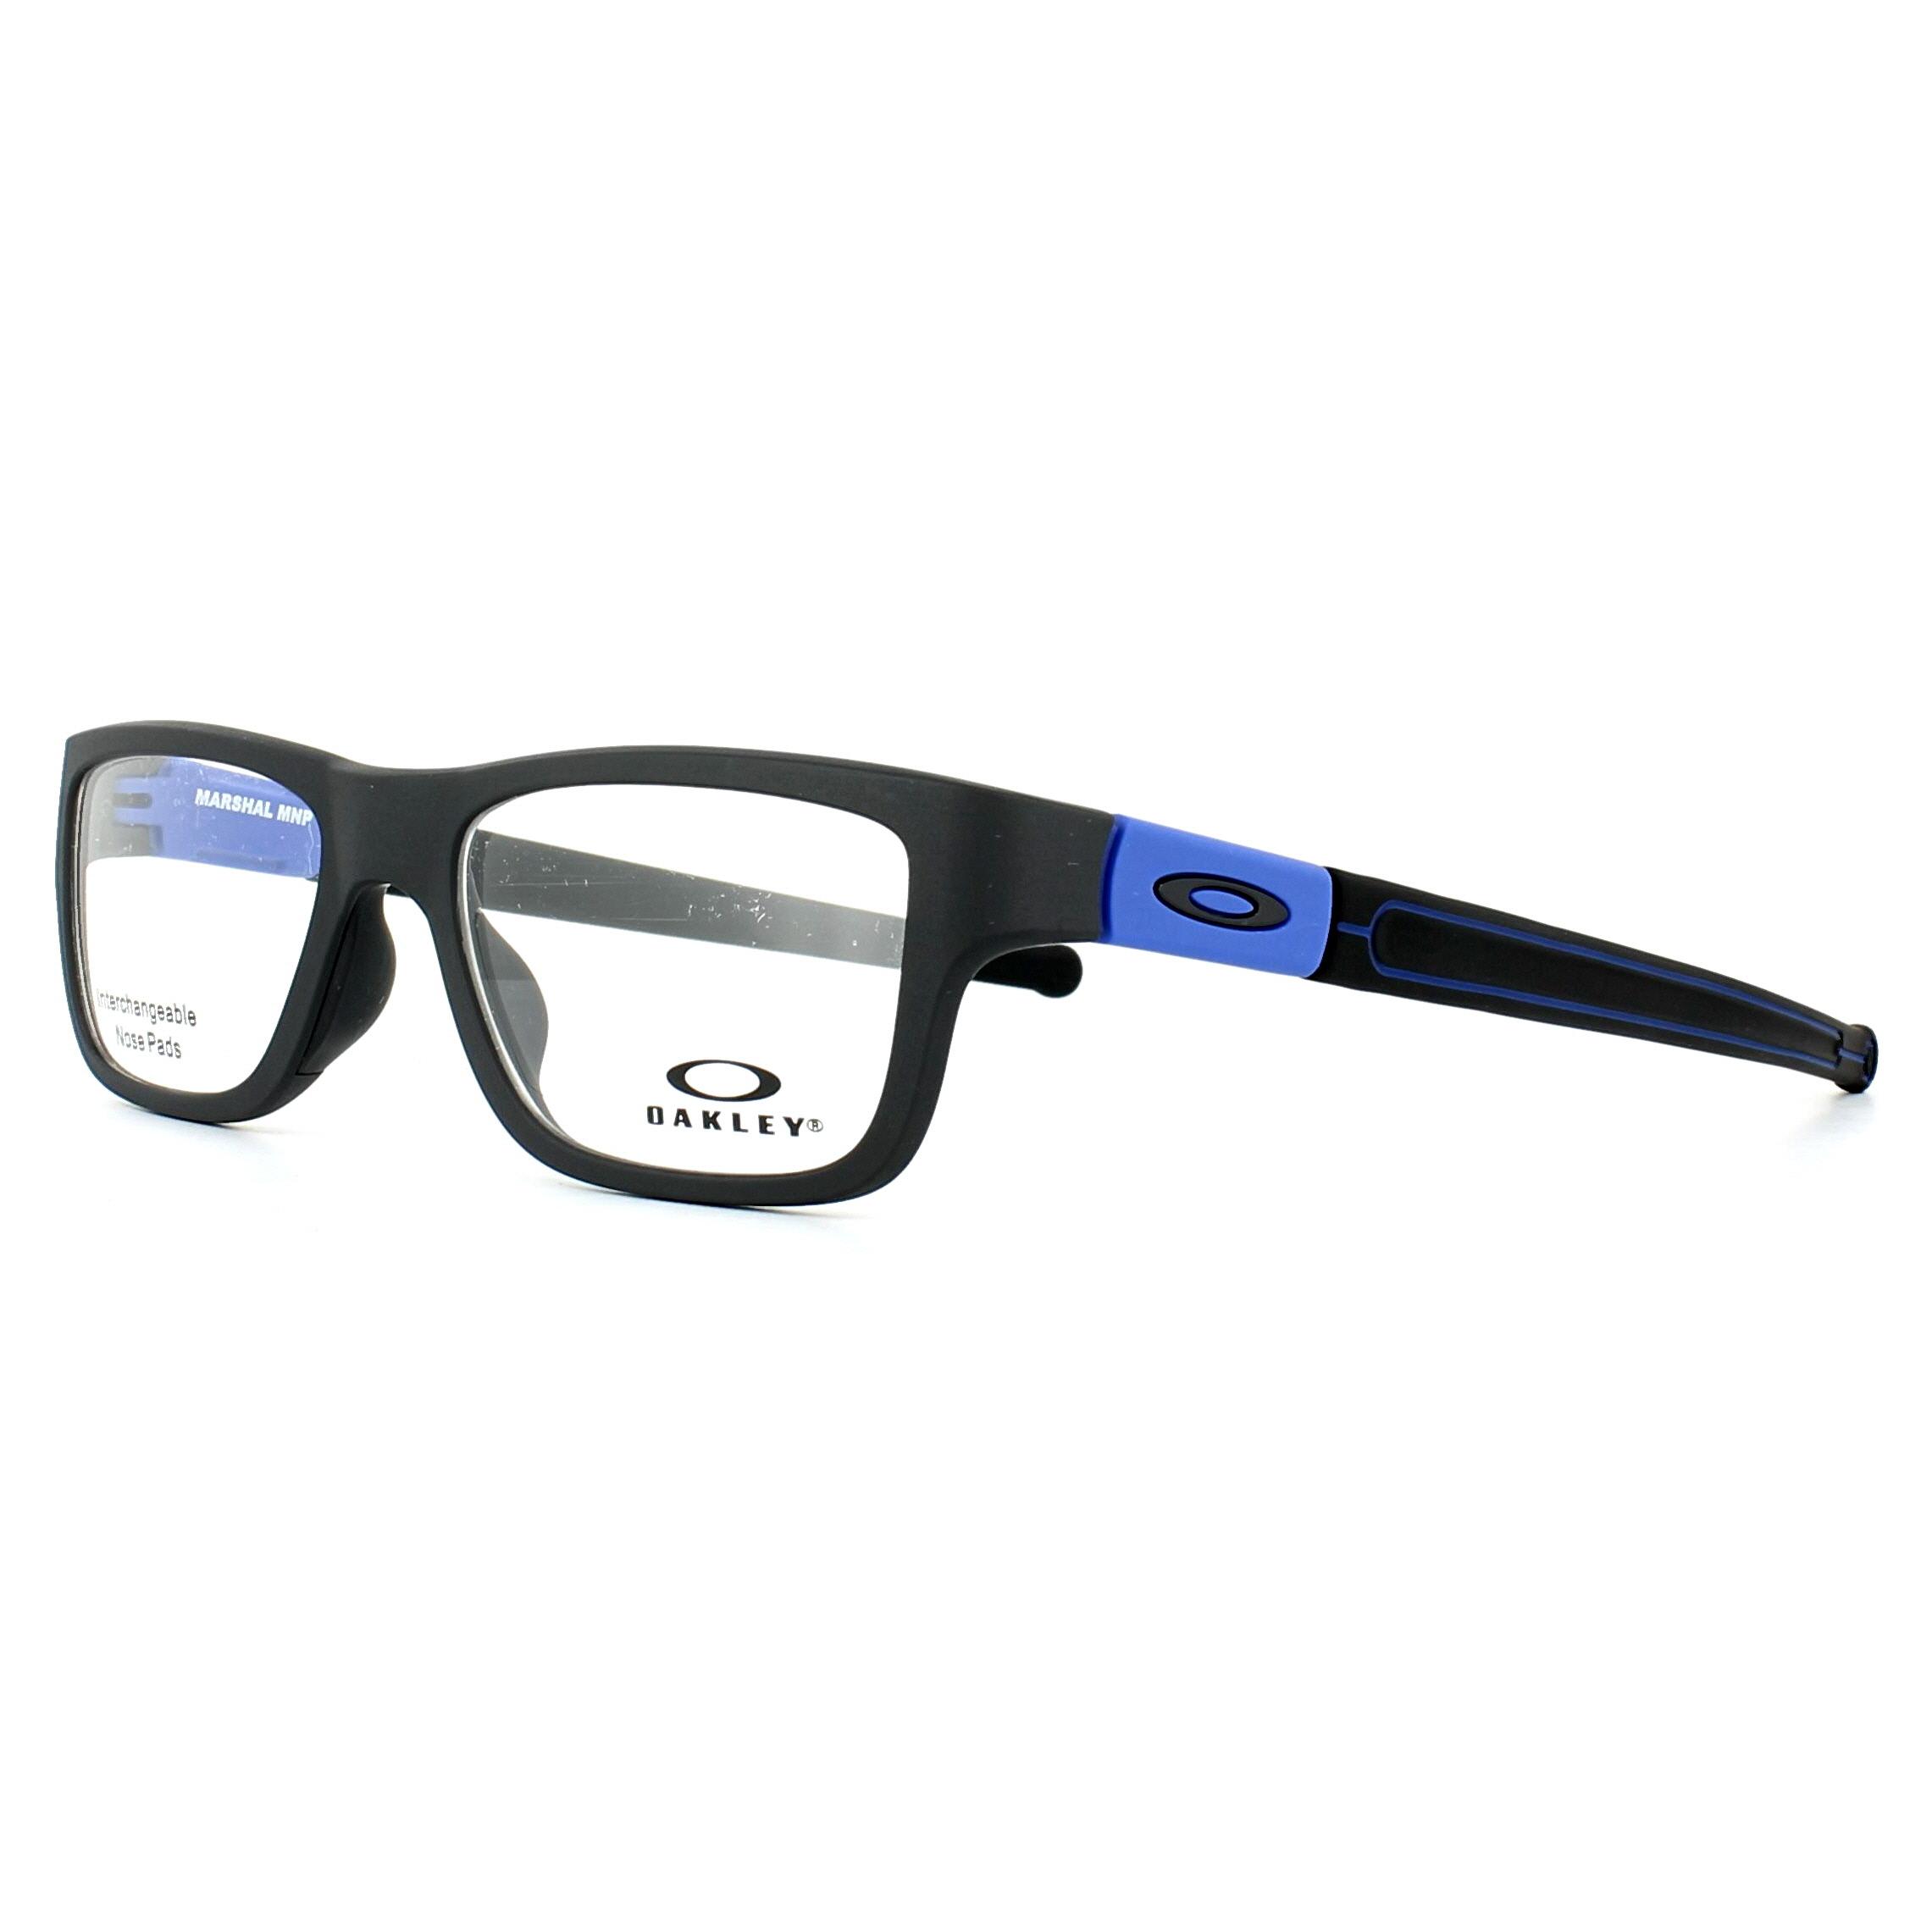 6fe6d57b43 Sentinel Oakley Glasses Frames Marshal Trubridge OX8091-05 Satin Black  Cobalt 51mm Mens